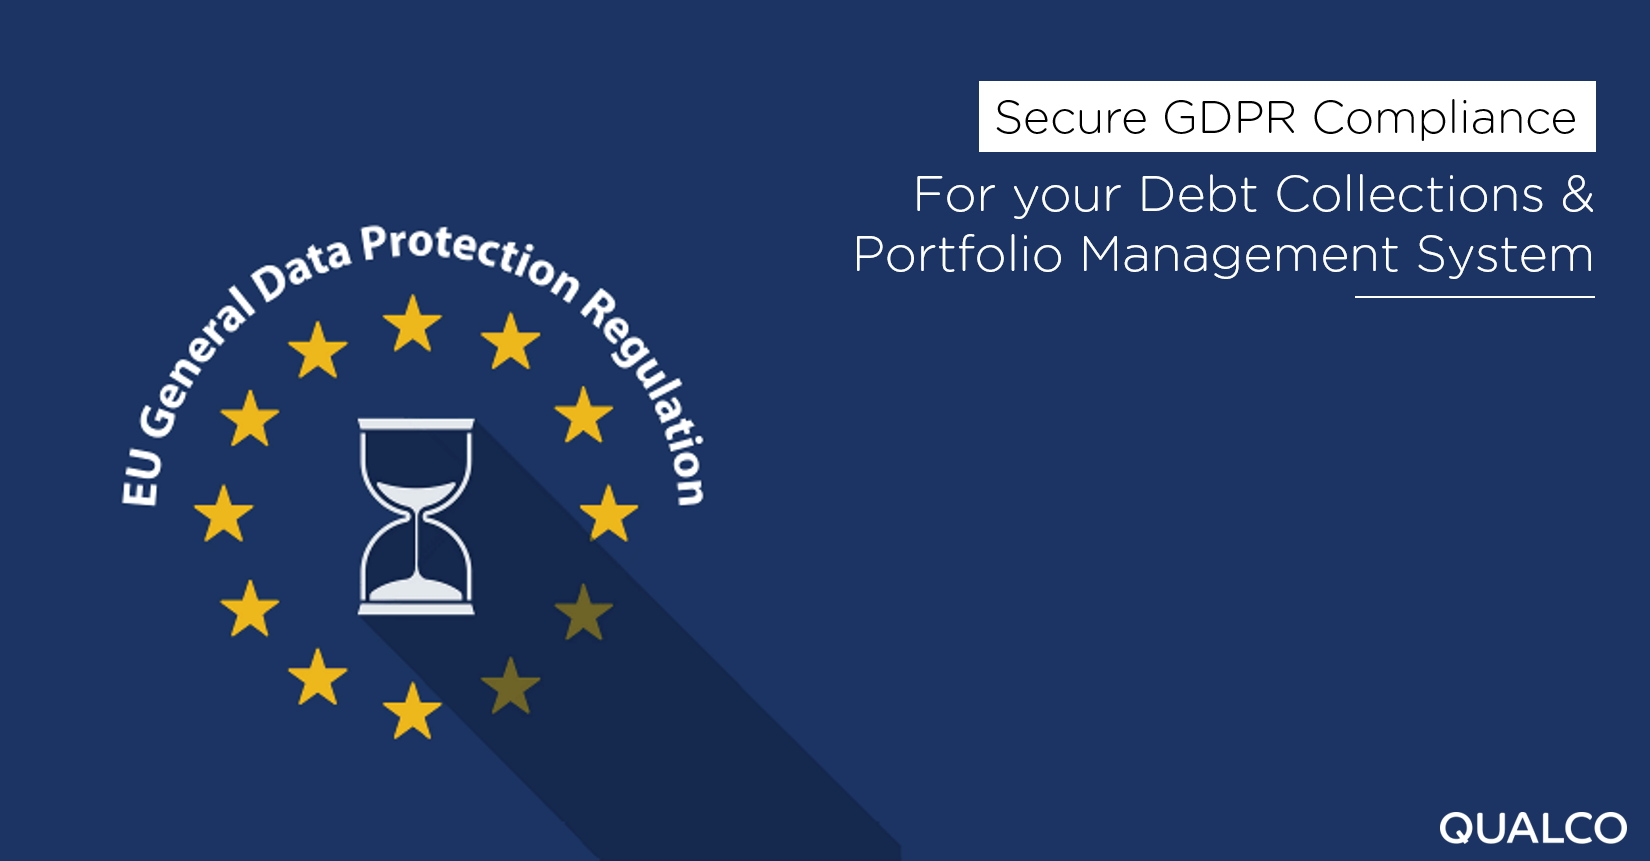 Secure GDPR Compliance